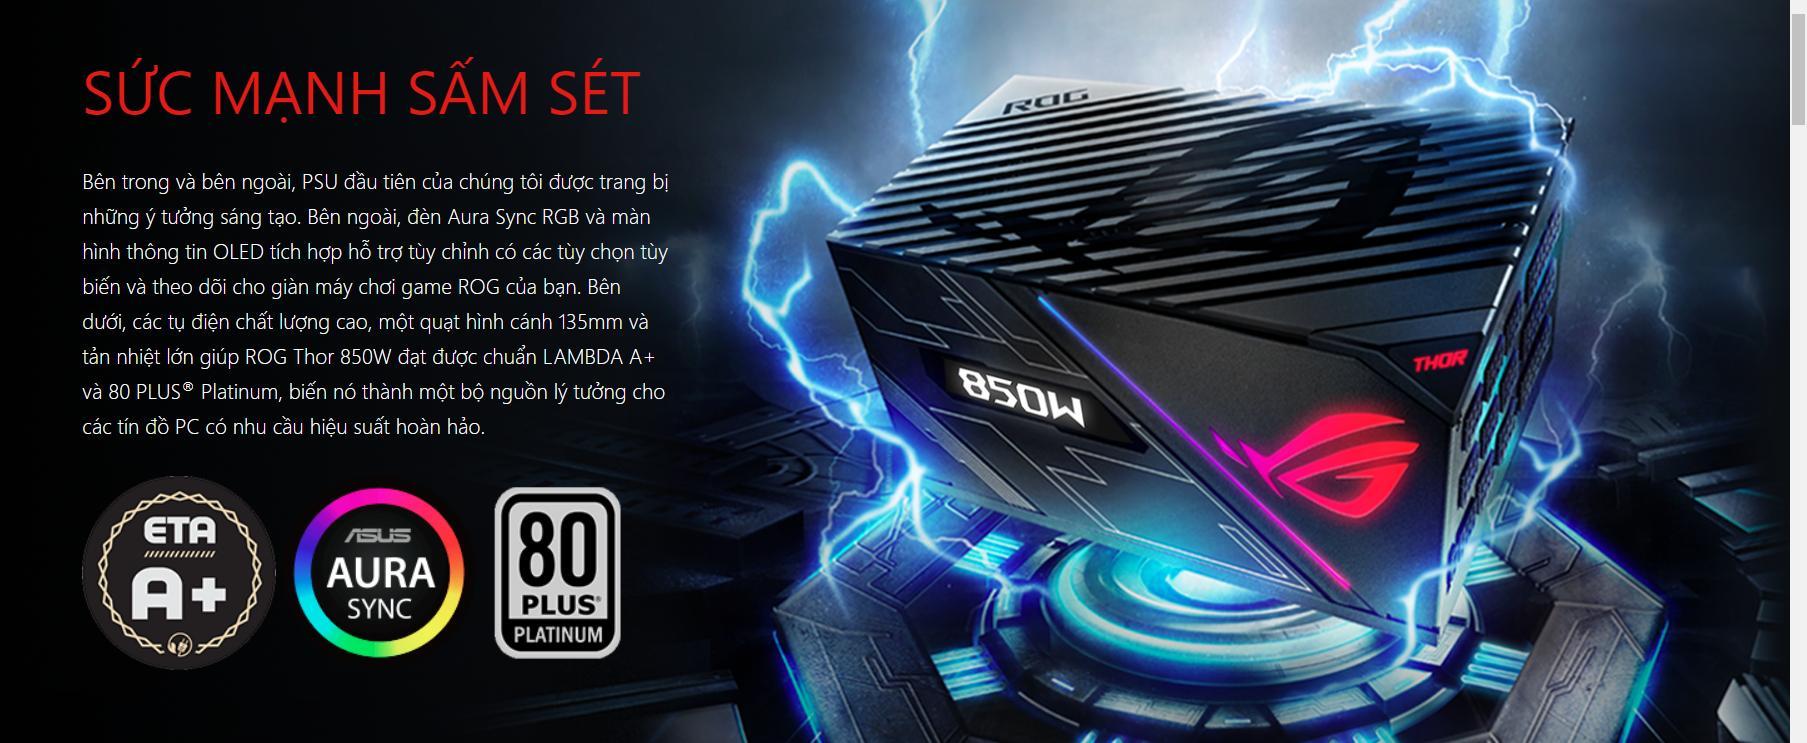 Nguồn Asus ROG Thor 850W Platinum - RGB 850W 80 Plus Platinum Full Modular giới thiệu 3